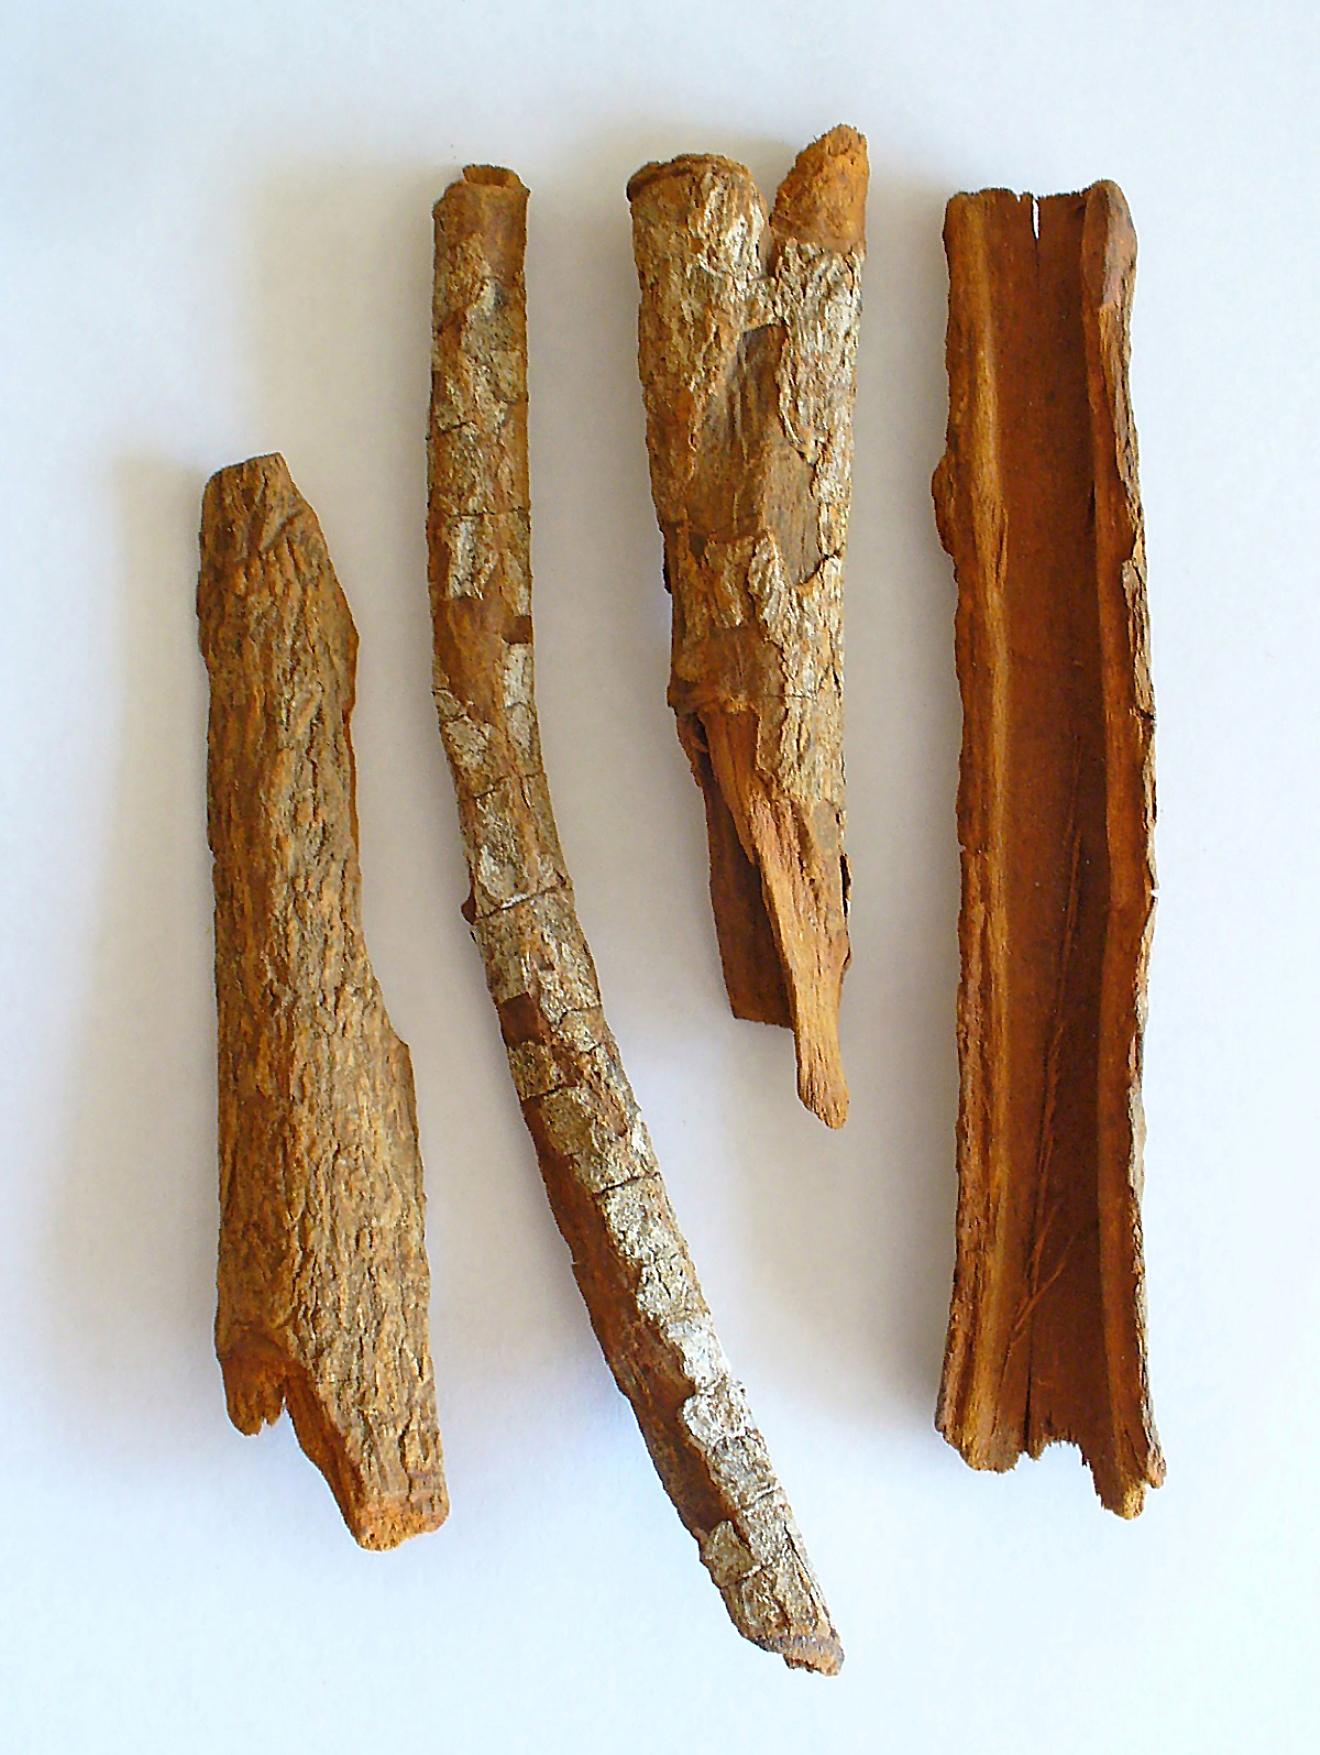 File:Cinchona officinalis 001.JPG - Wikimedia Commons